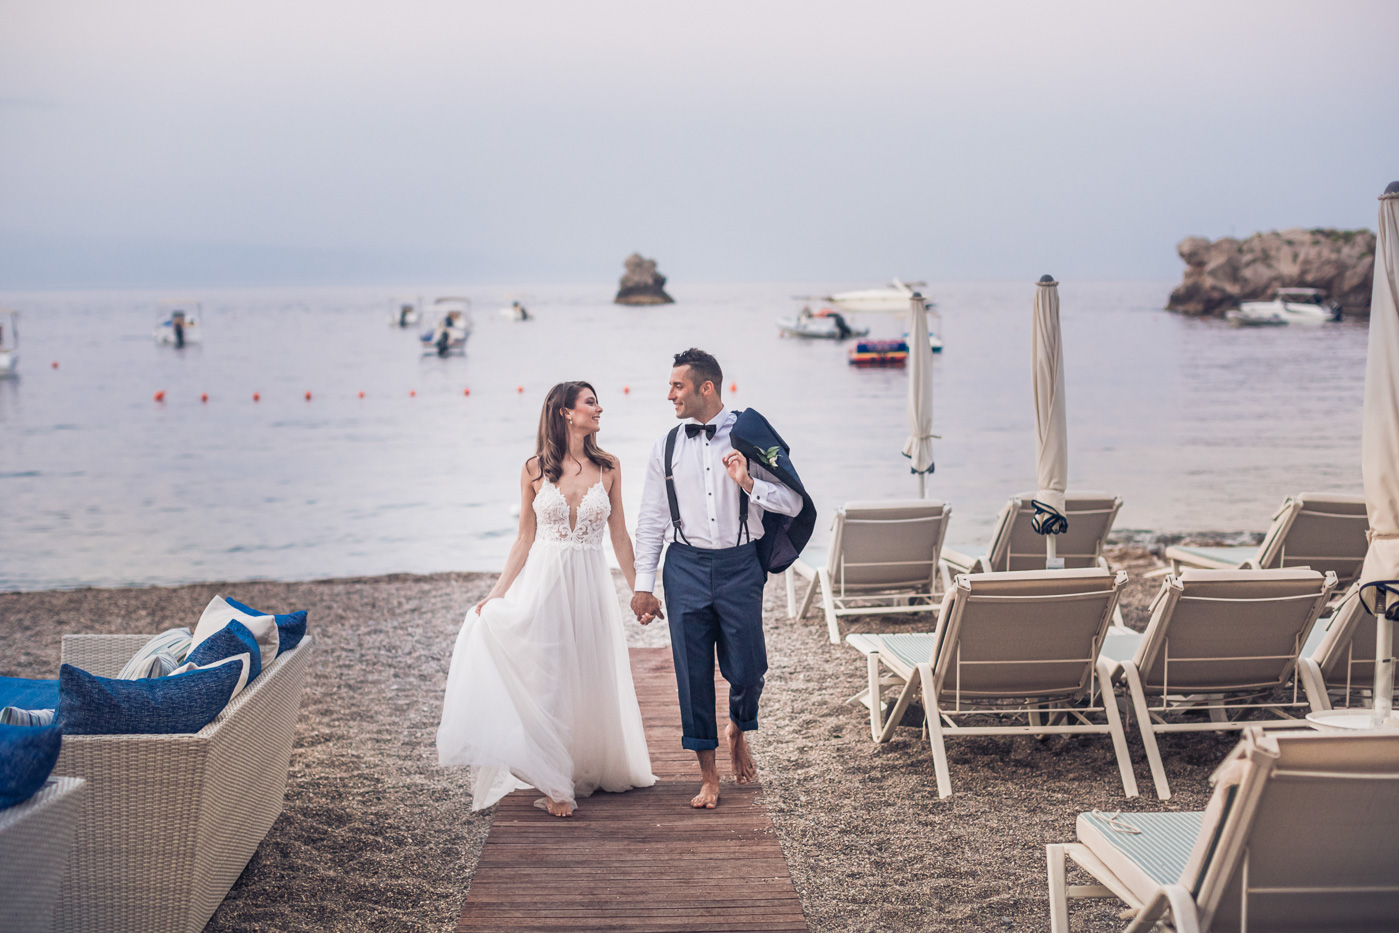 Jewish wedding Taormina sea _photographer_videographer-top-belmond-villa-santandrea-bride-groom-photos